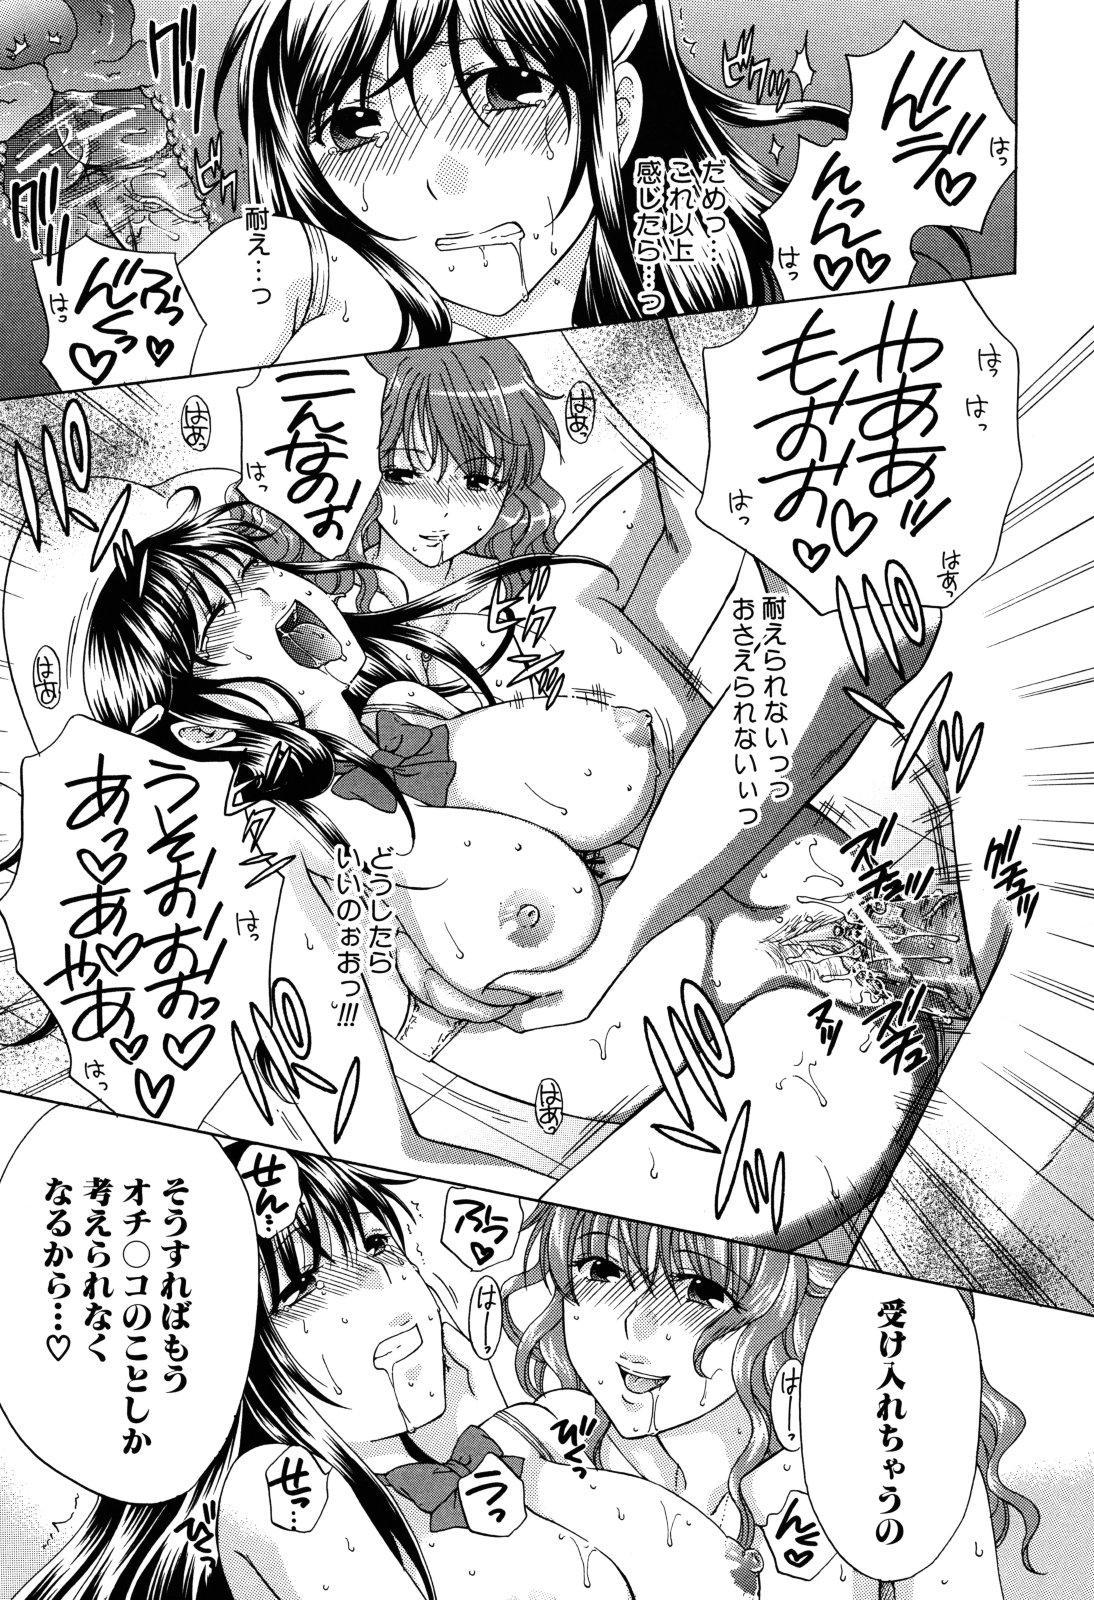 Kanojo ga Ochiru made - She in the depth 198